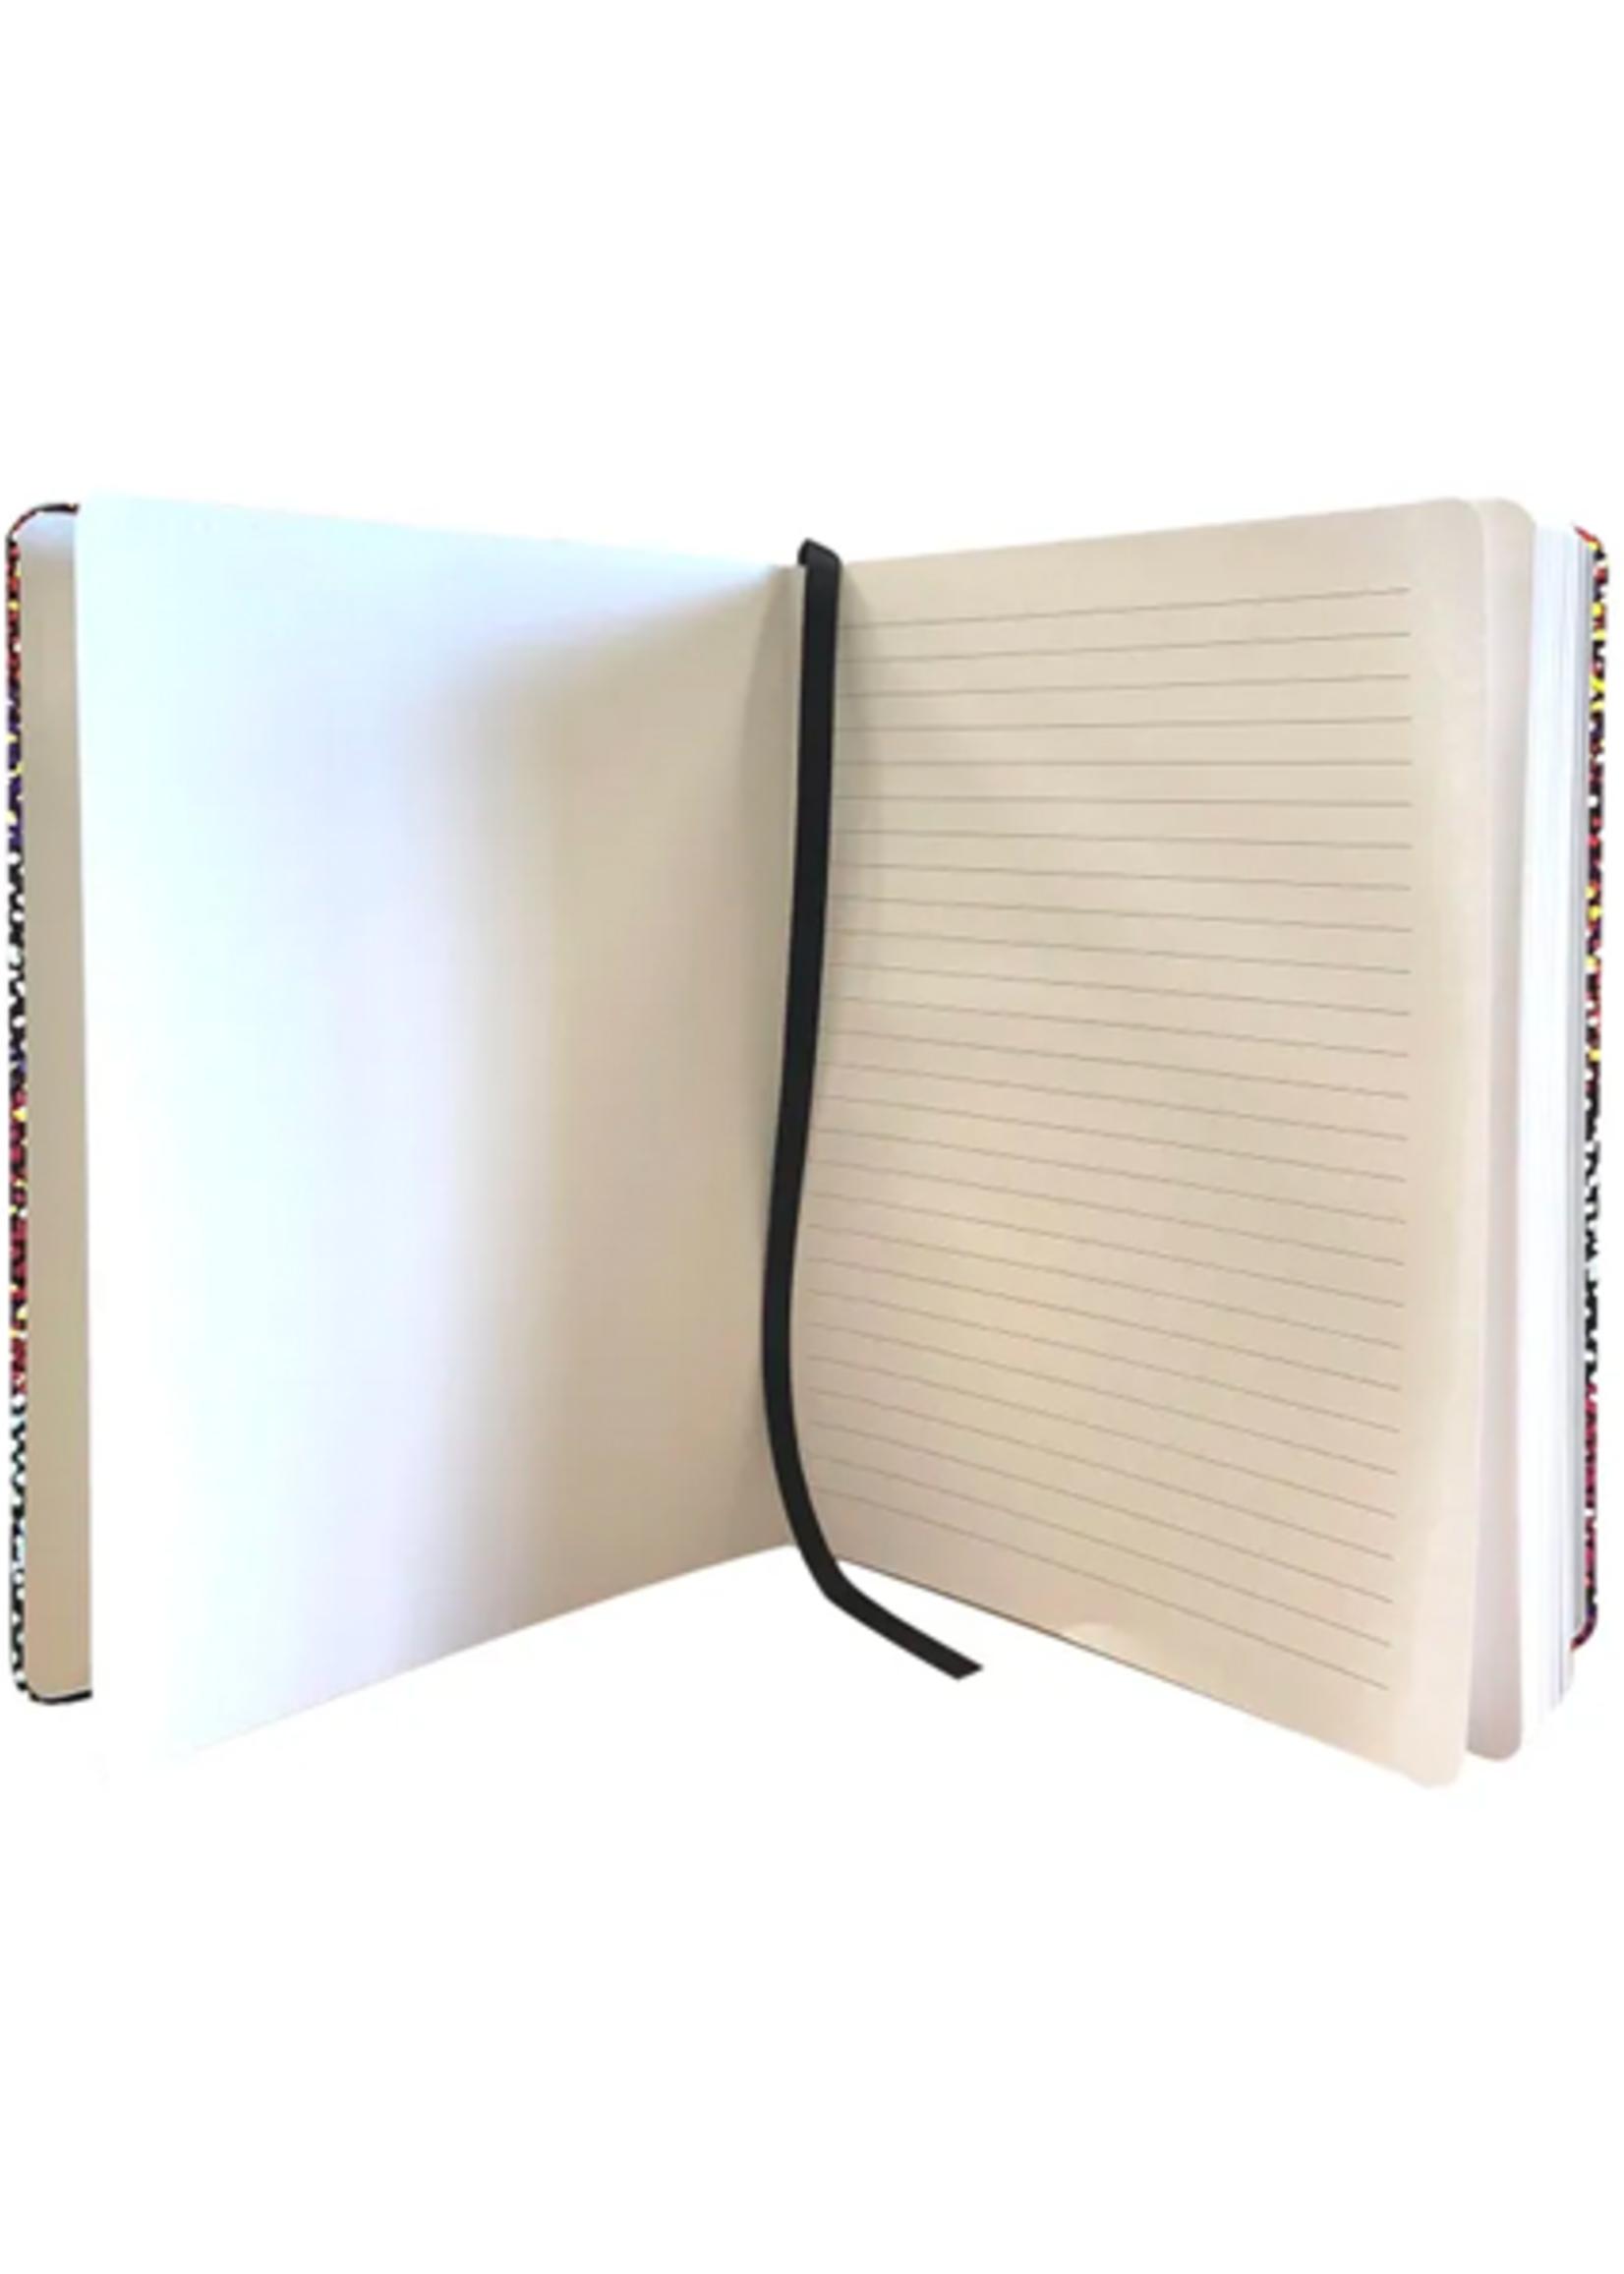 Utopia PU Leather Journal - Janelle Stockman 212